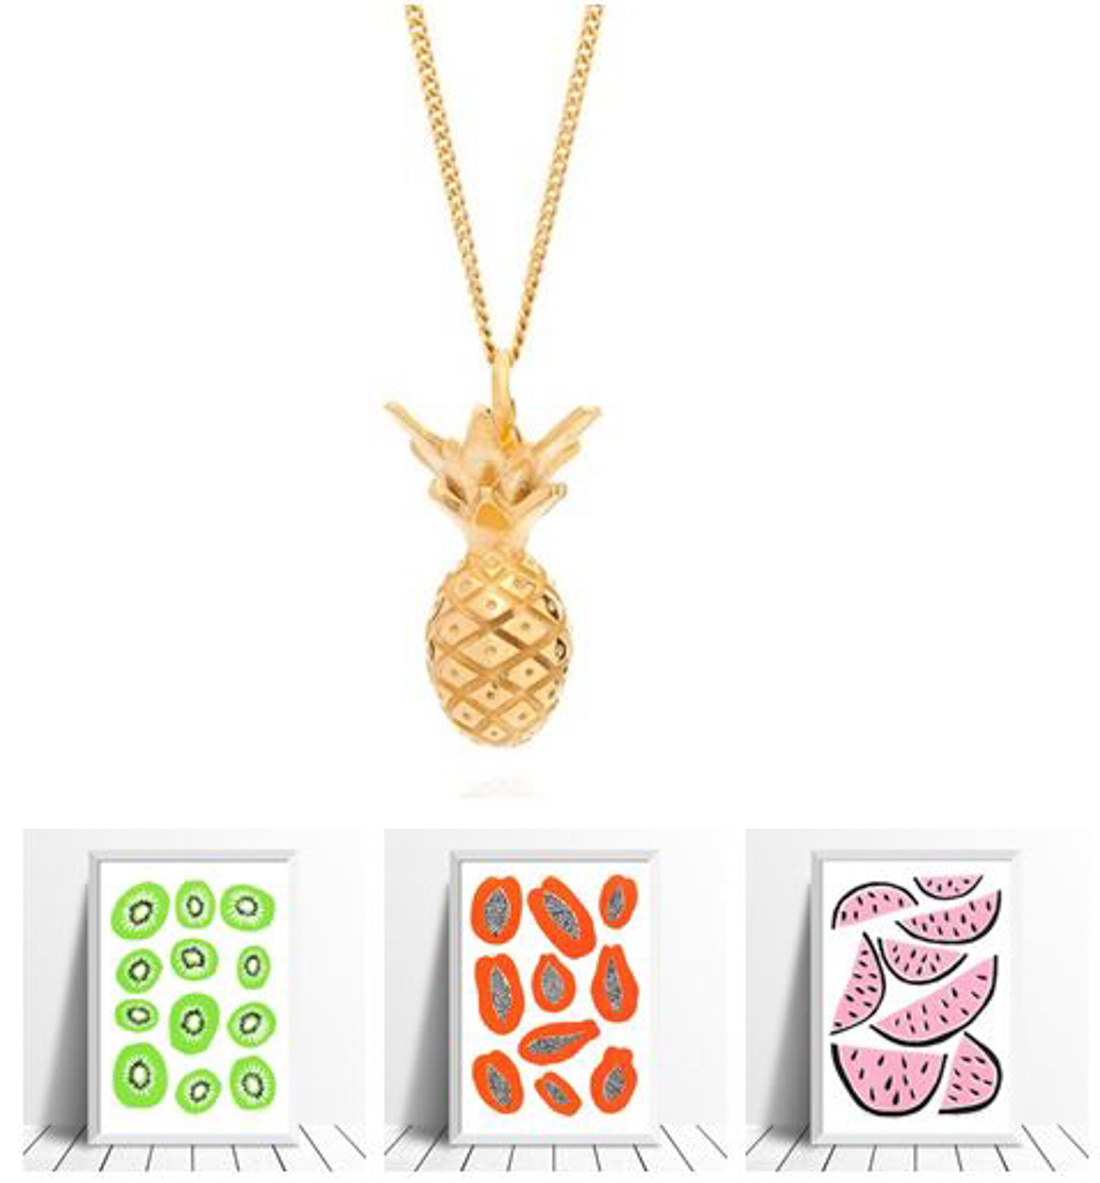 Pineapple necklace Lee Renee